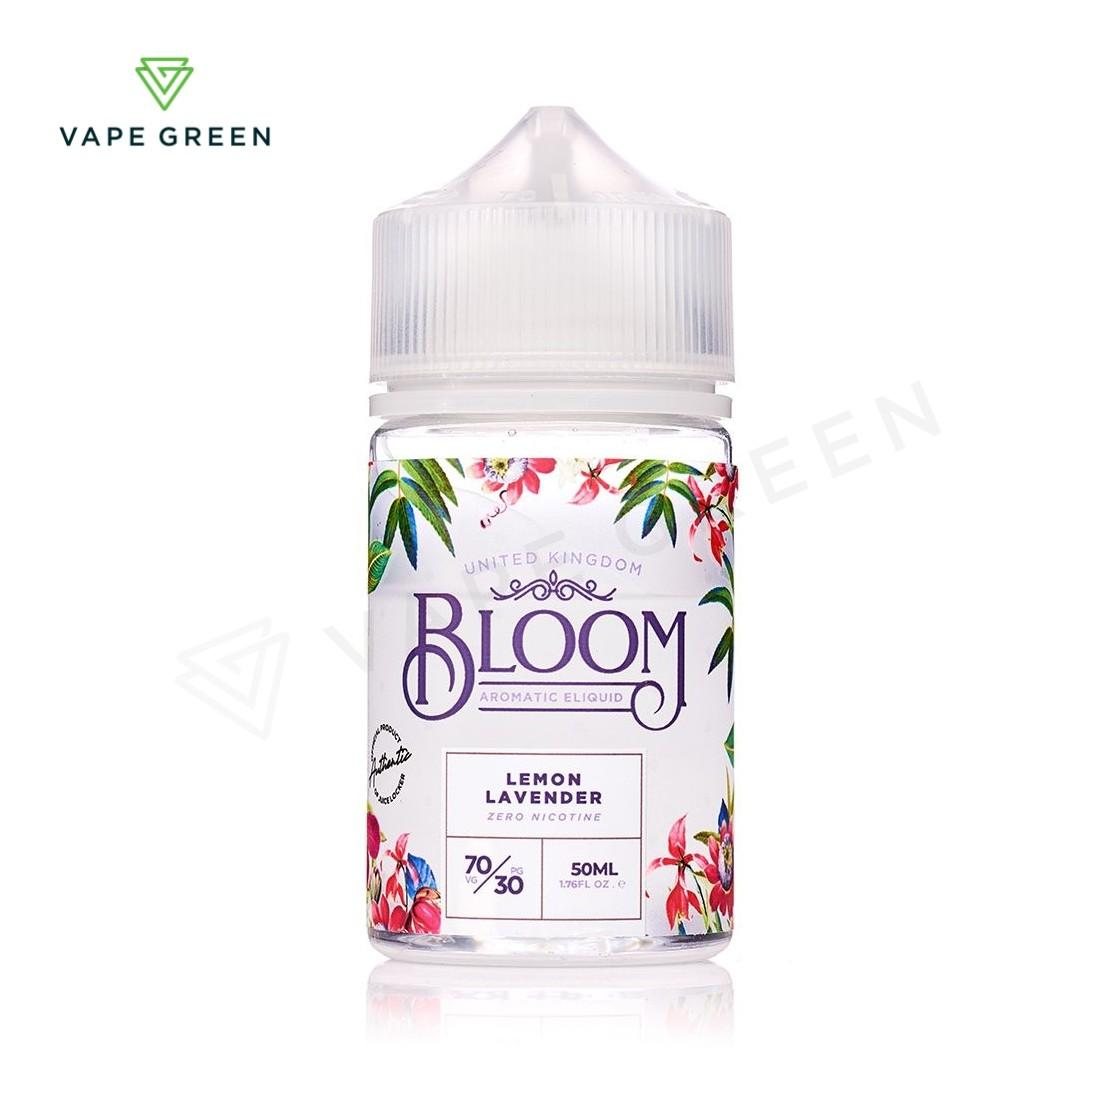 Lemon Lavender E-Liquid by Bloom 50ml